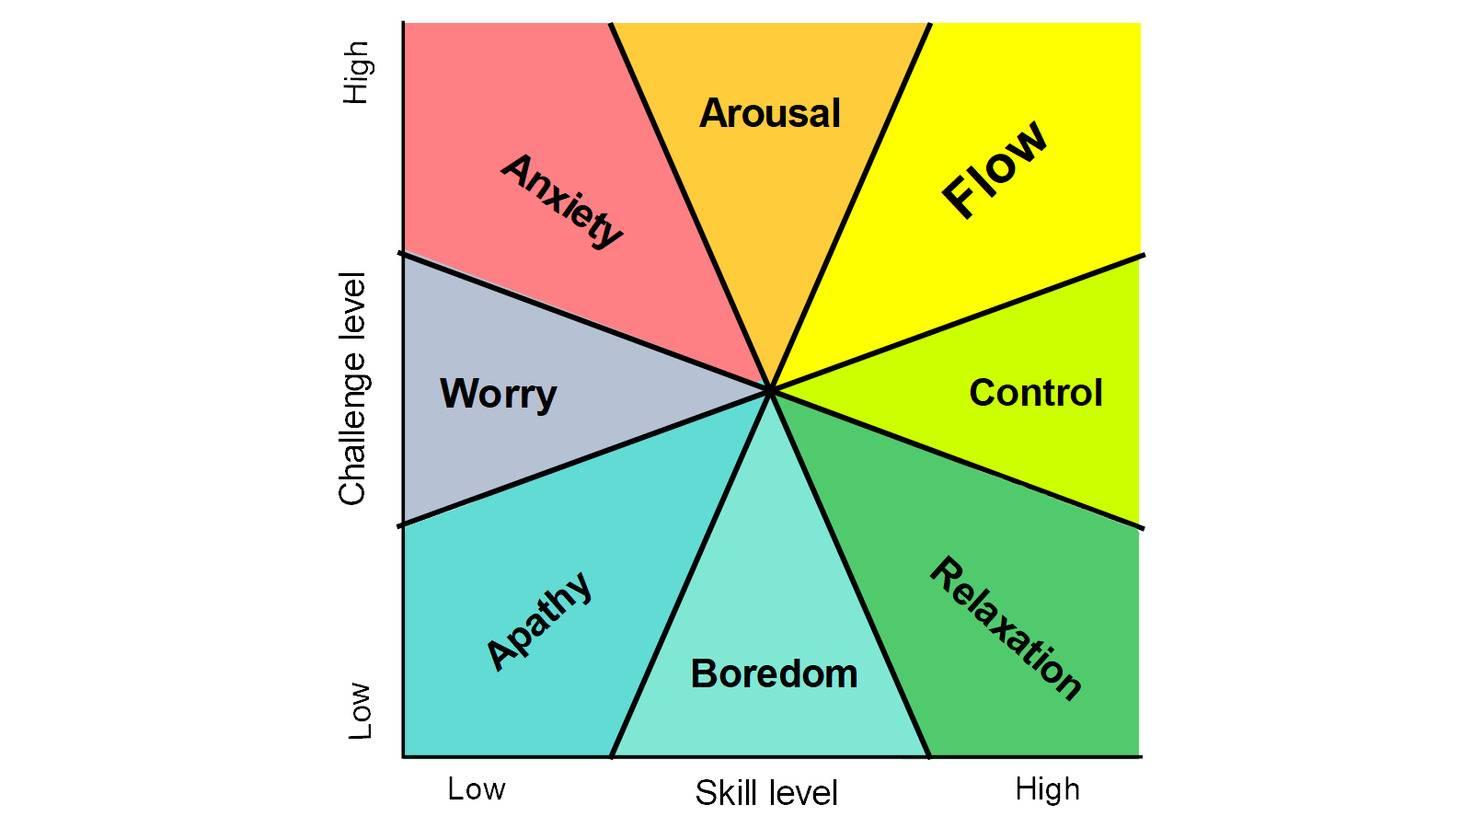 flow-herausforderung-vs-skill